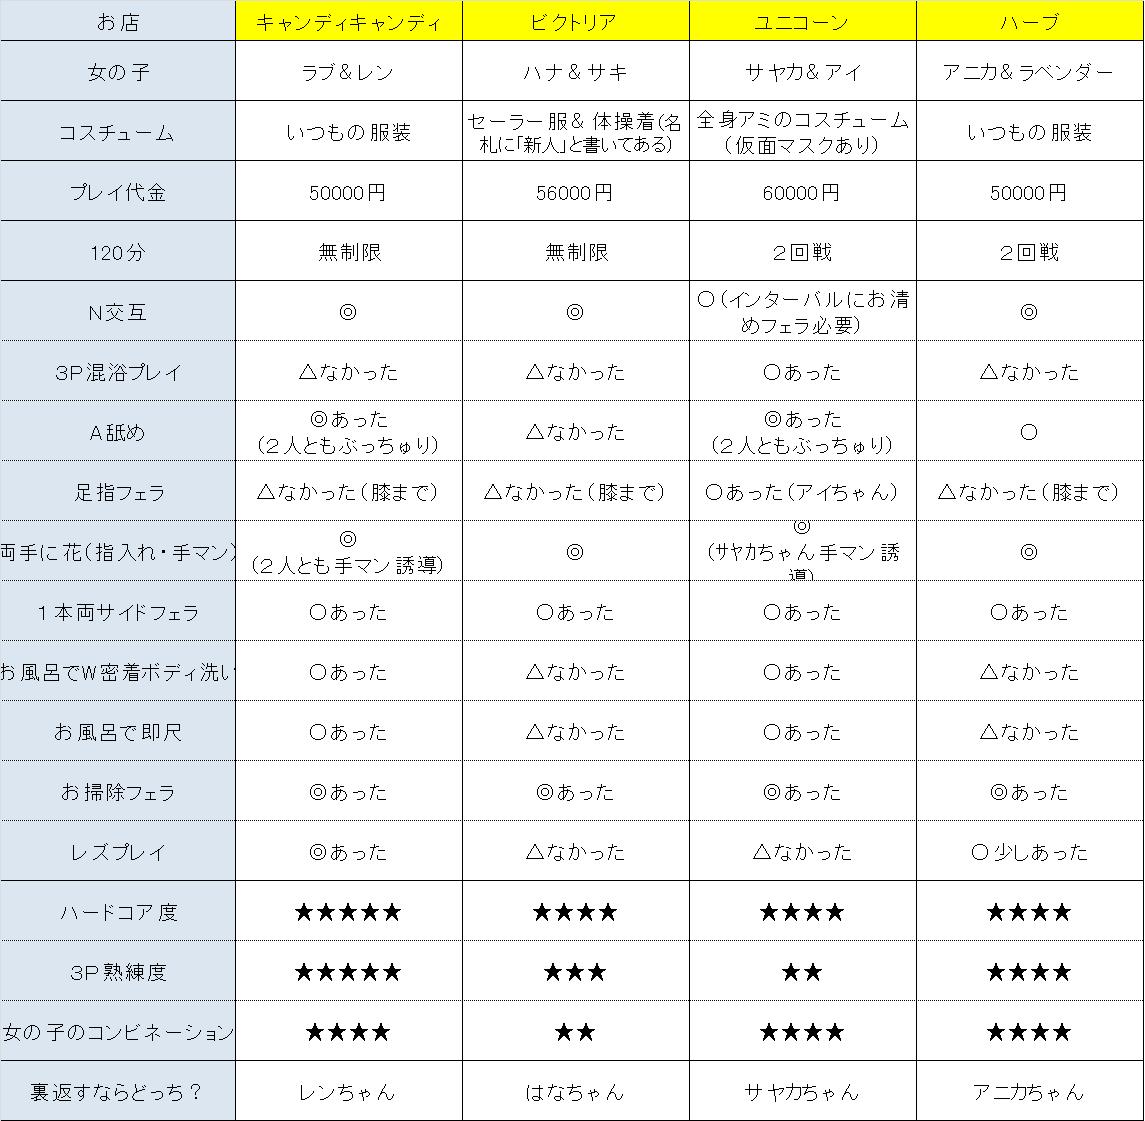 【3P仕様比較表】年末3P企画のまとめ